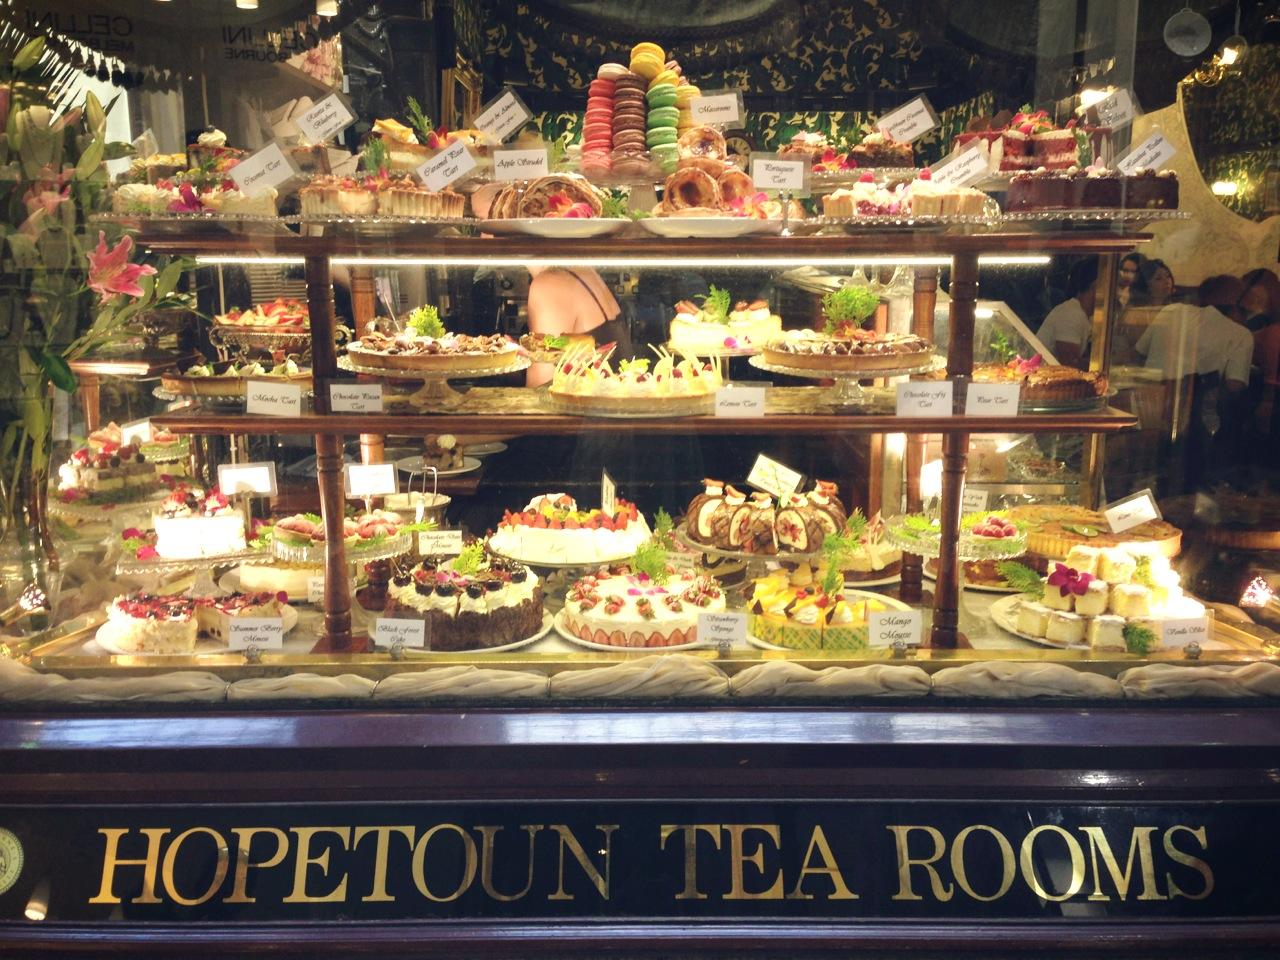 20. Hopetoun Tea Rooms